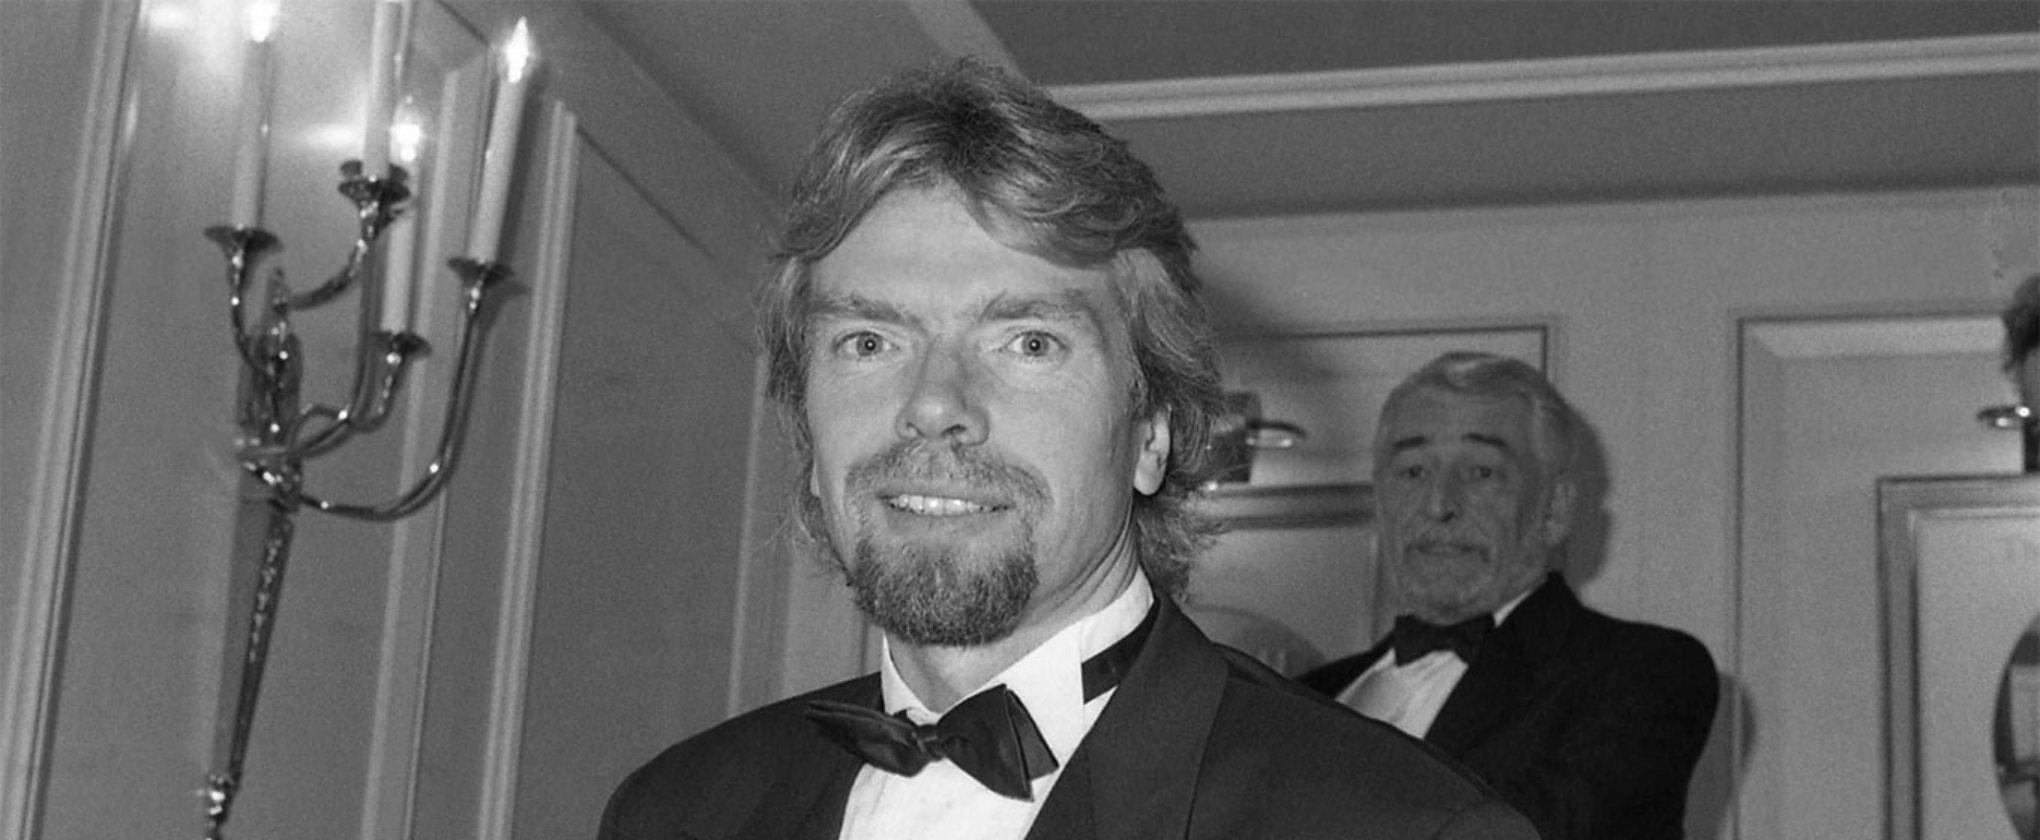 Robots, Detectives & Sir Richard Branson